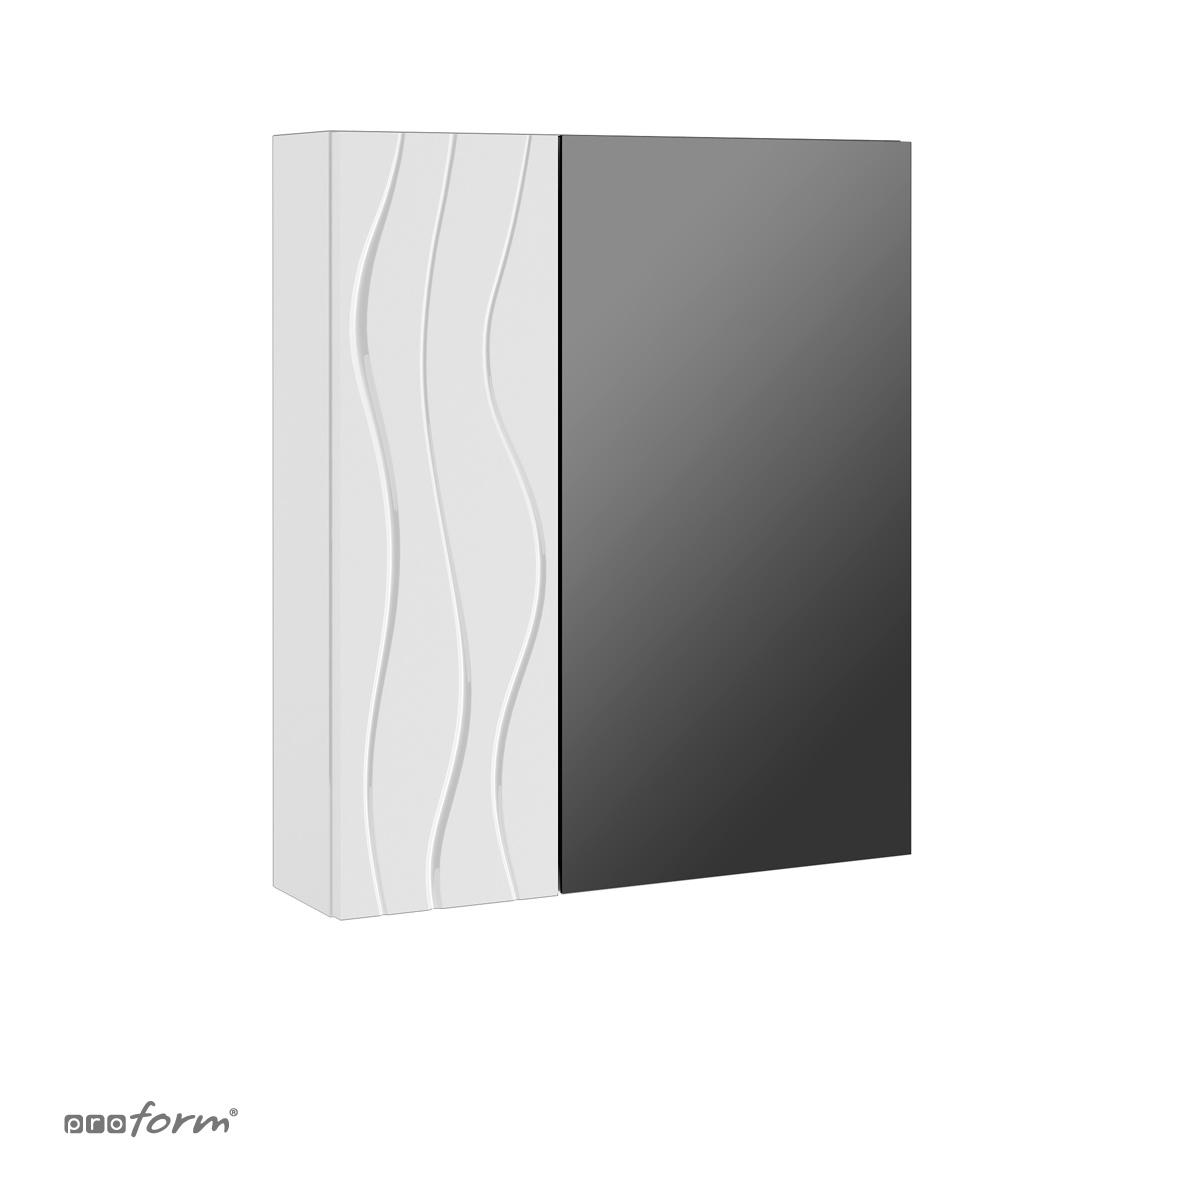 Szafka ONDE z lustrem biała Proform